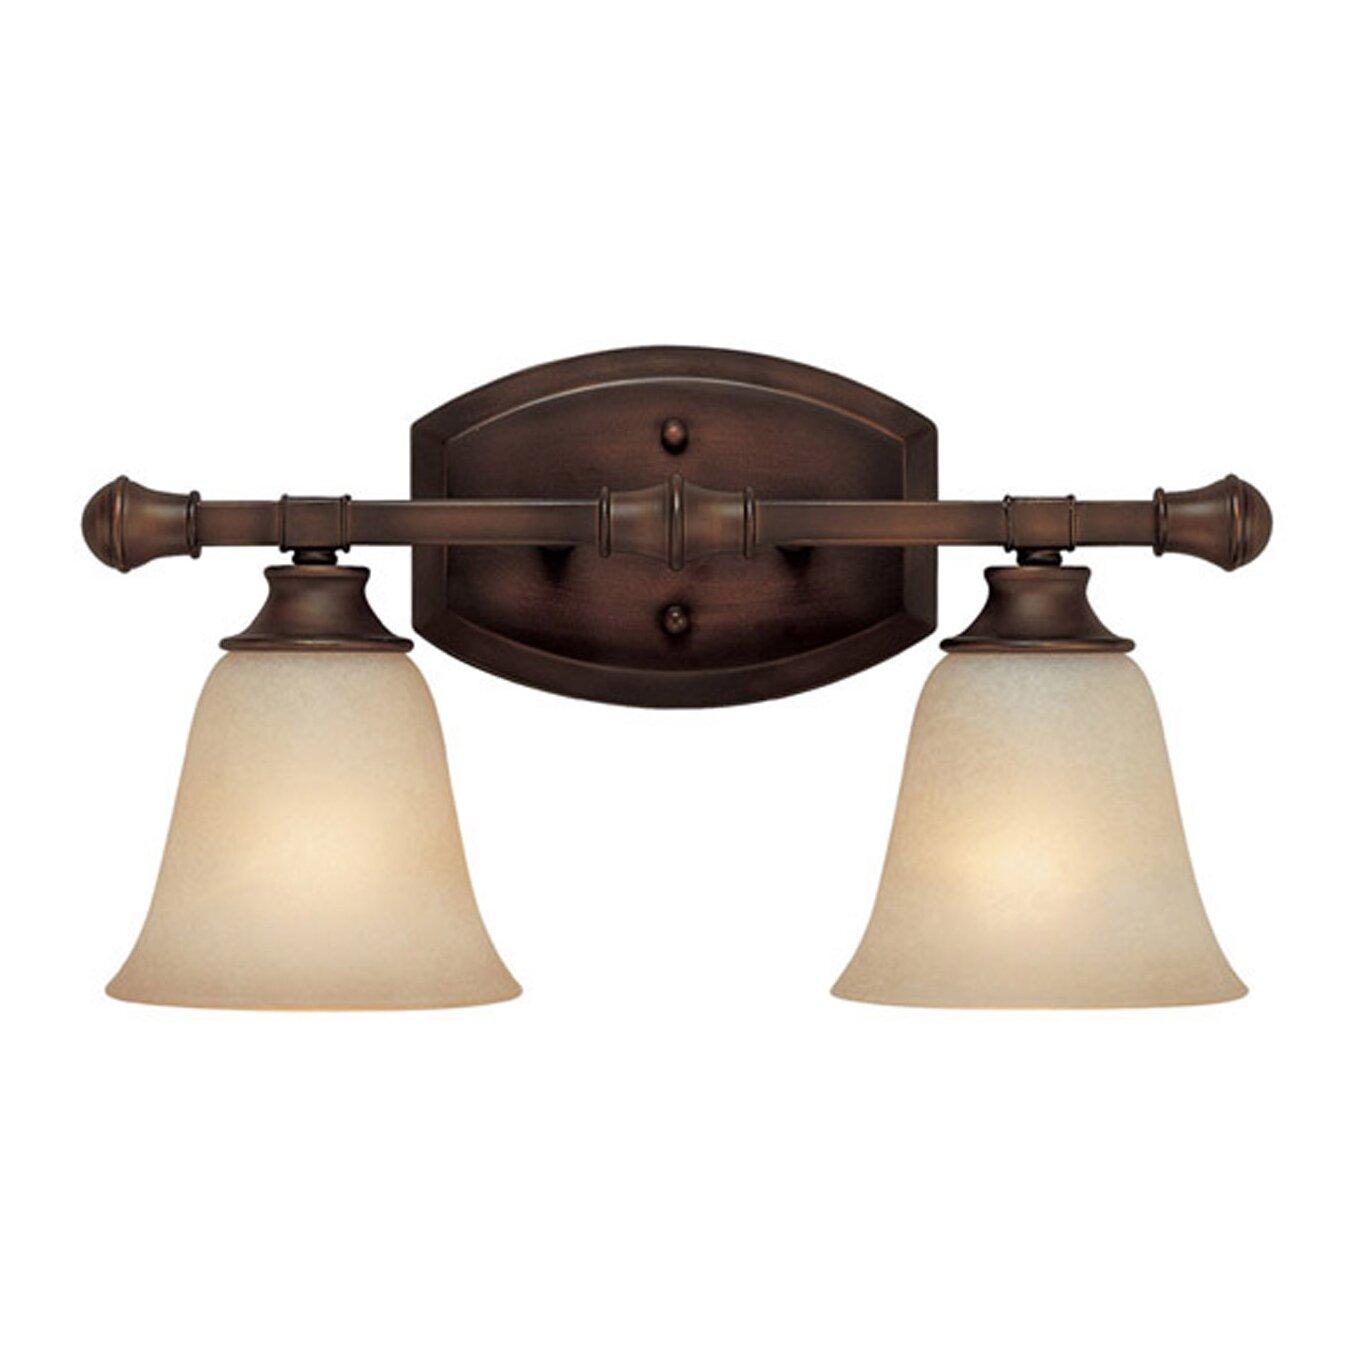 Charlton Home Lindenwood 2 Light Bath Vanity Light in Creek Stone & Reviews Wayfair